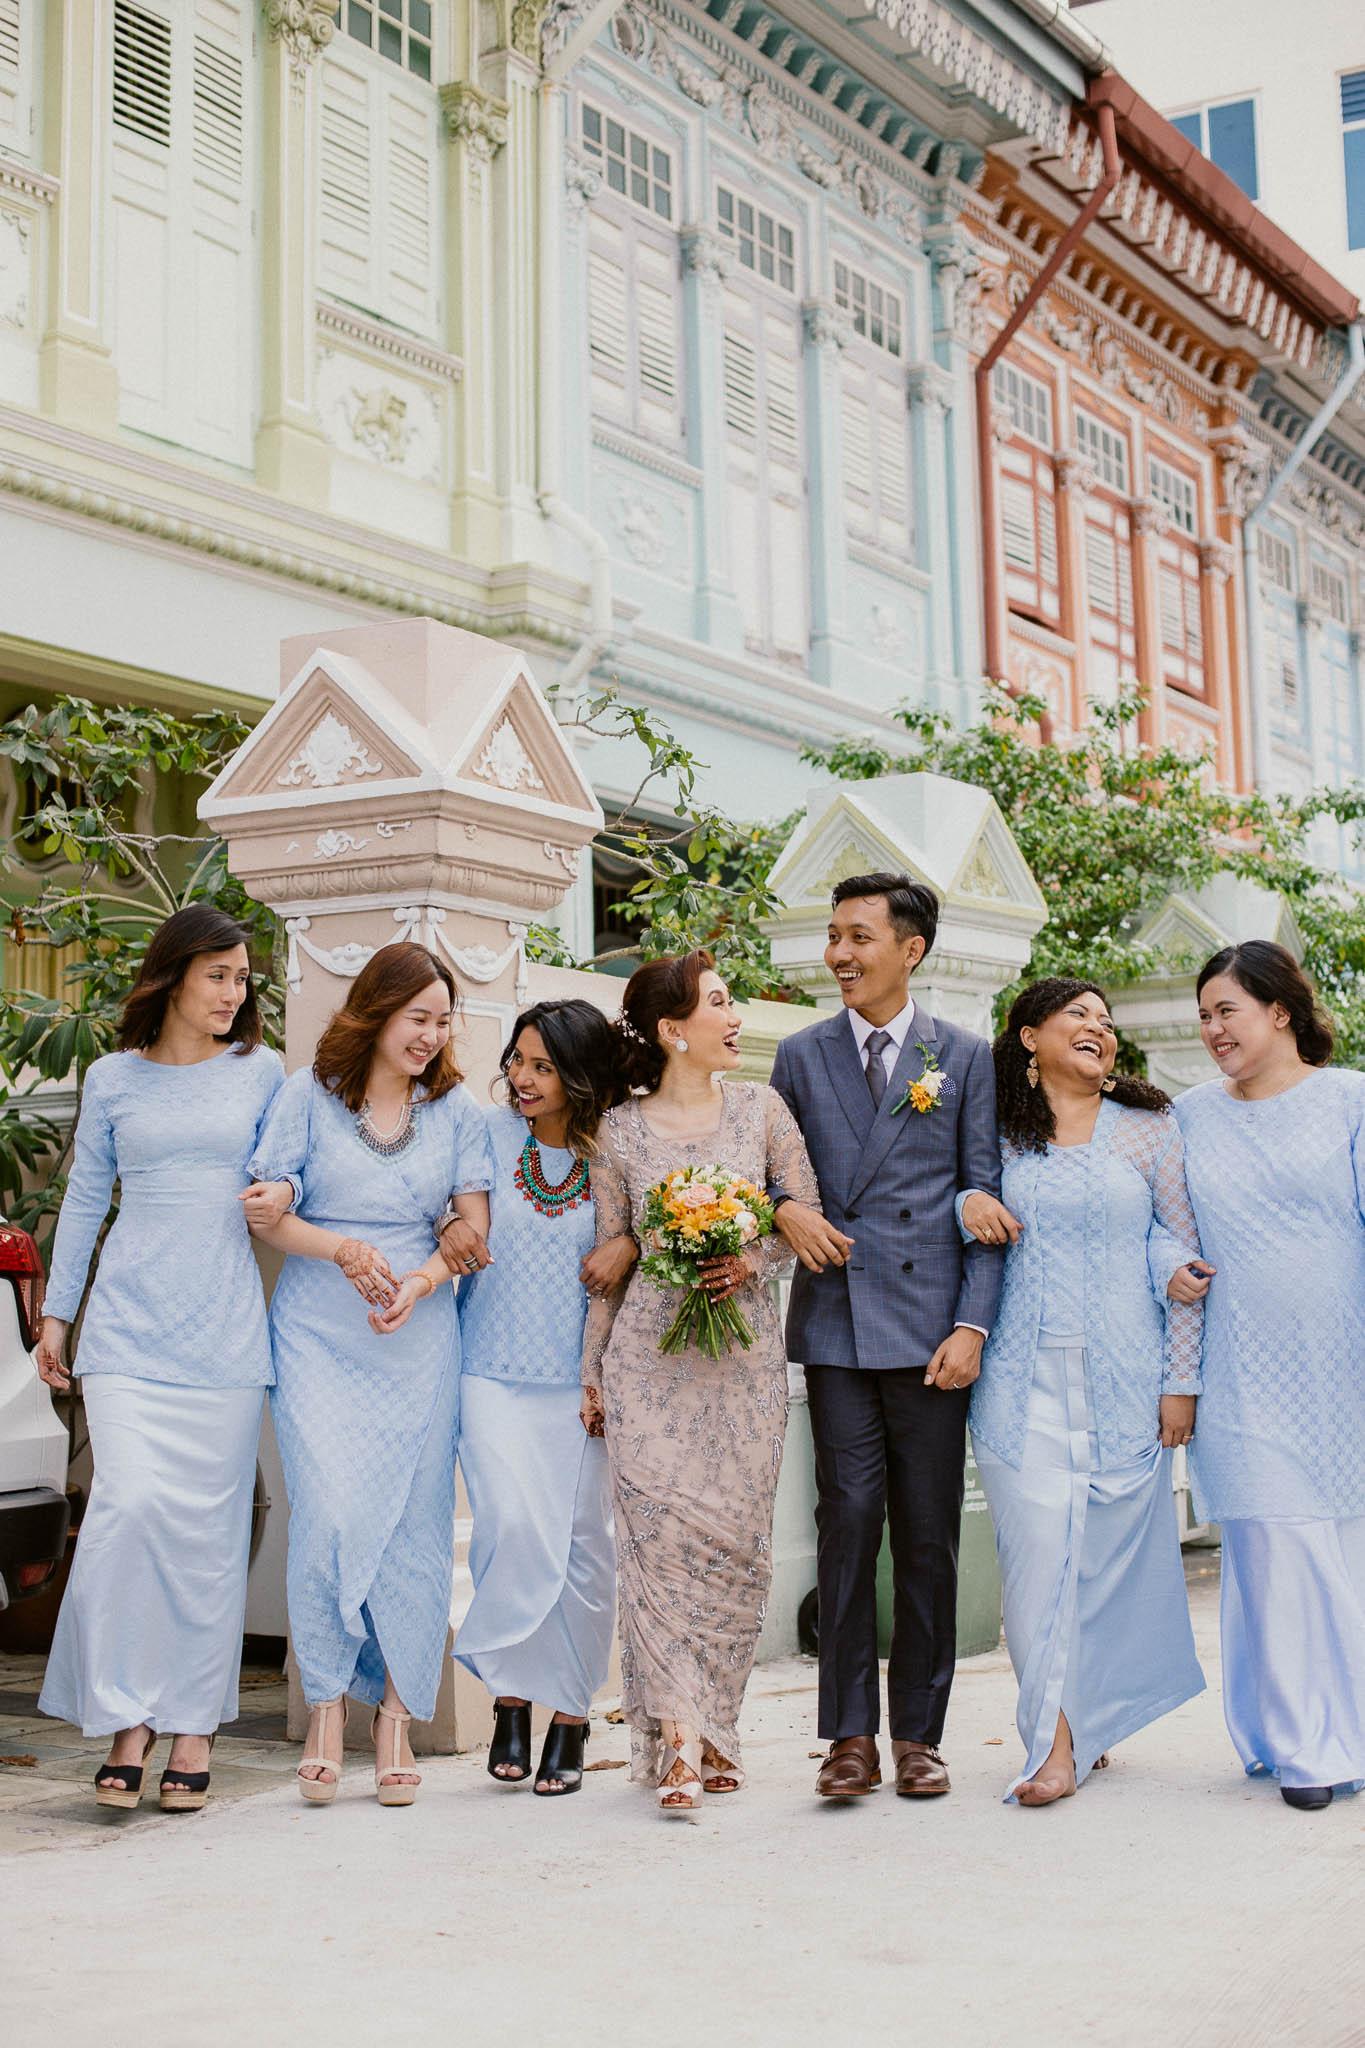 singapore-wedding-photographer-wedding-nufail-addafiq-073.jpg